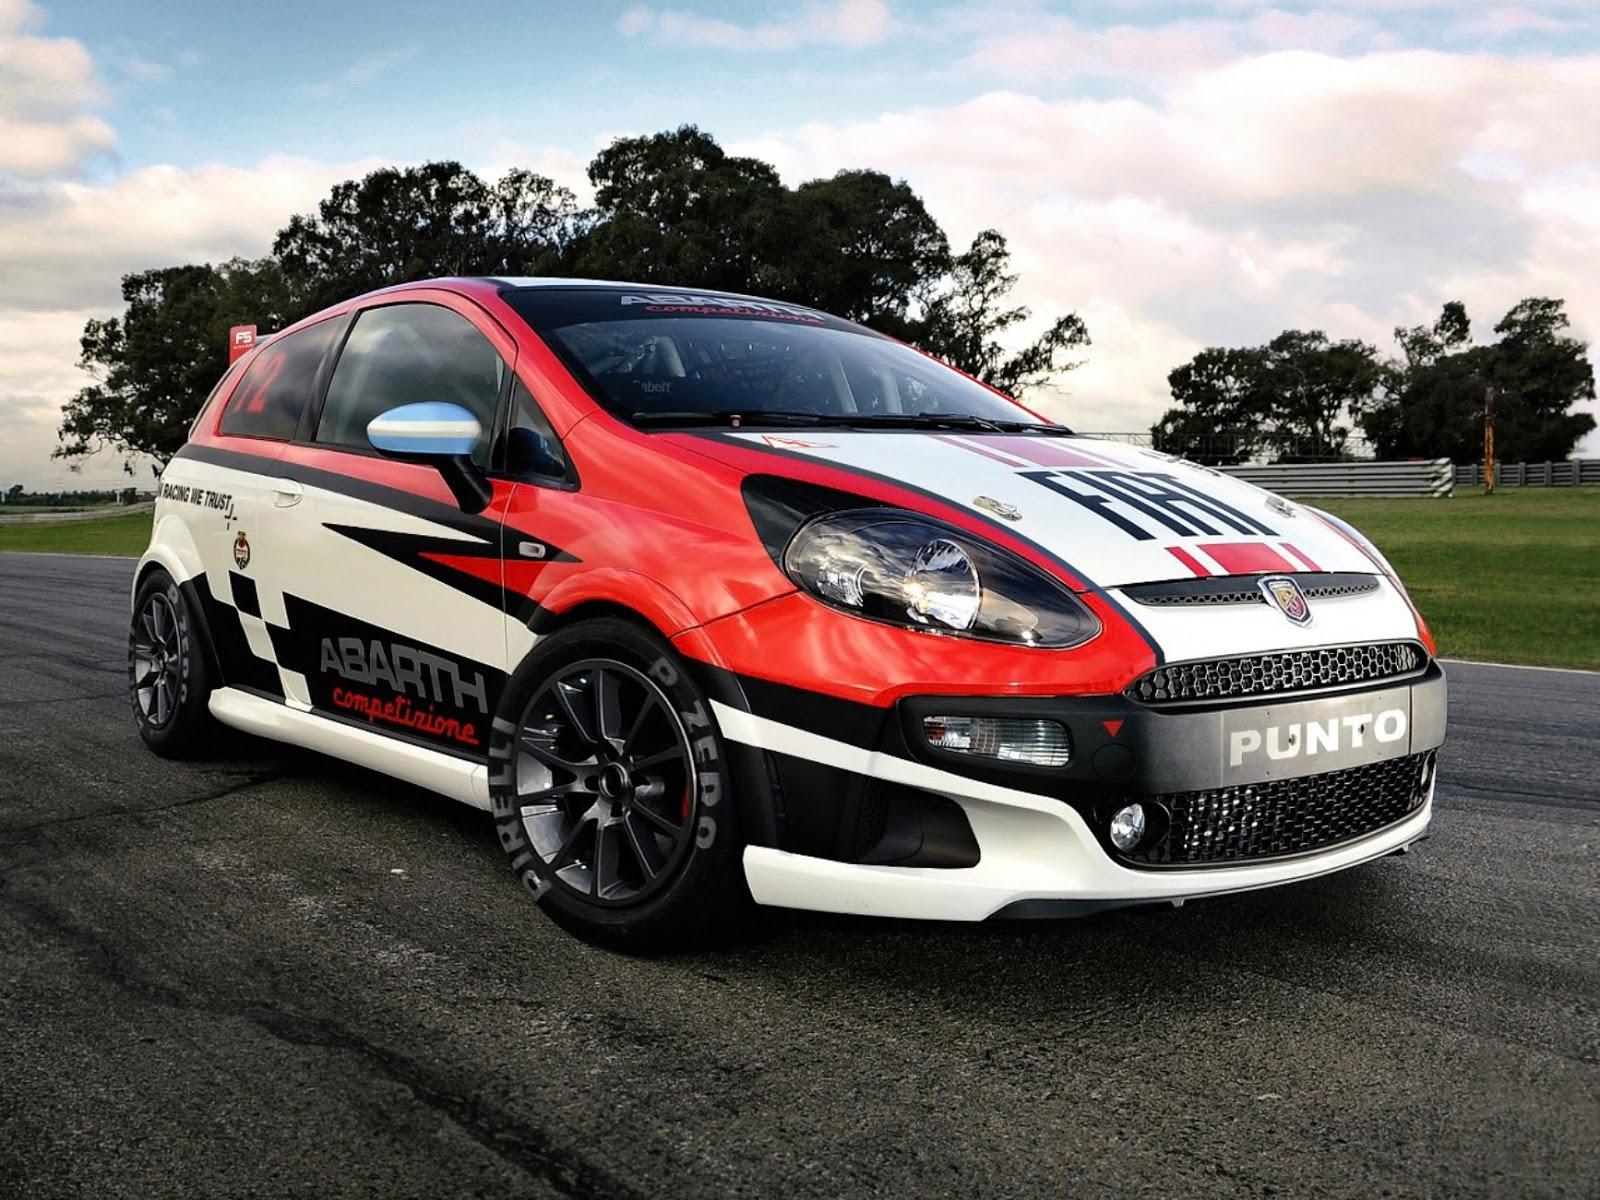 2012 Fiat Punto Abarth